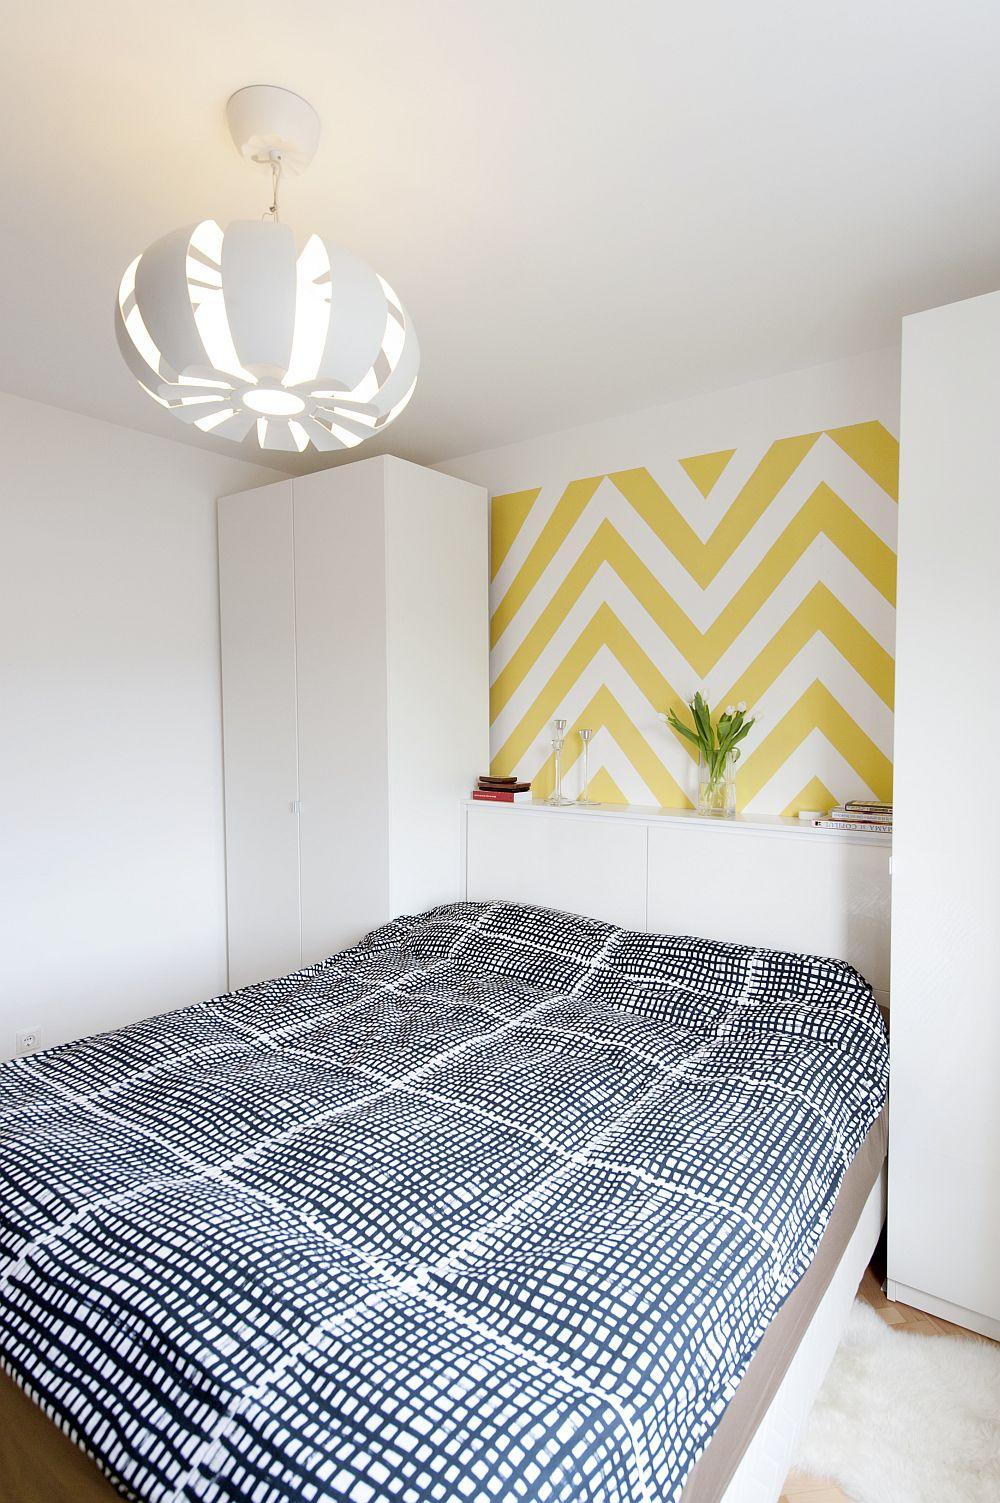 adelaparvu.com despre apartament 3 camere Tg Mures, designer Simona Ungurean (15)